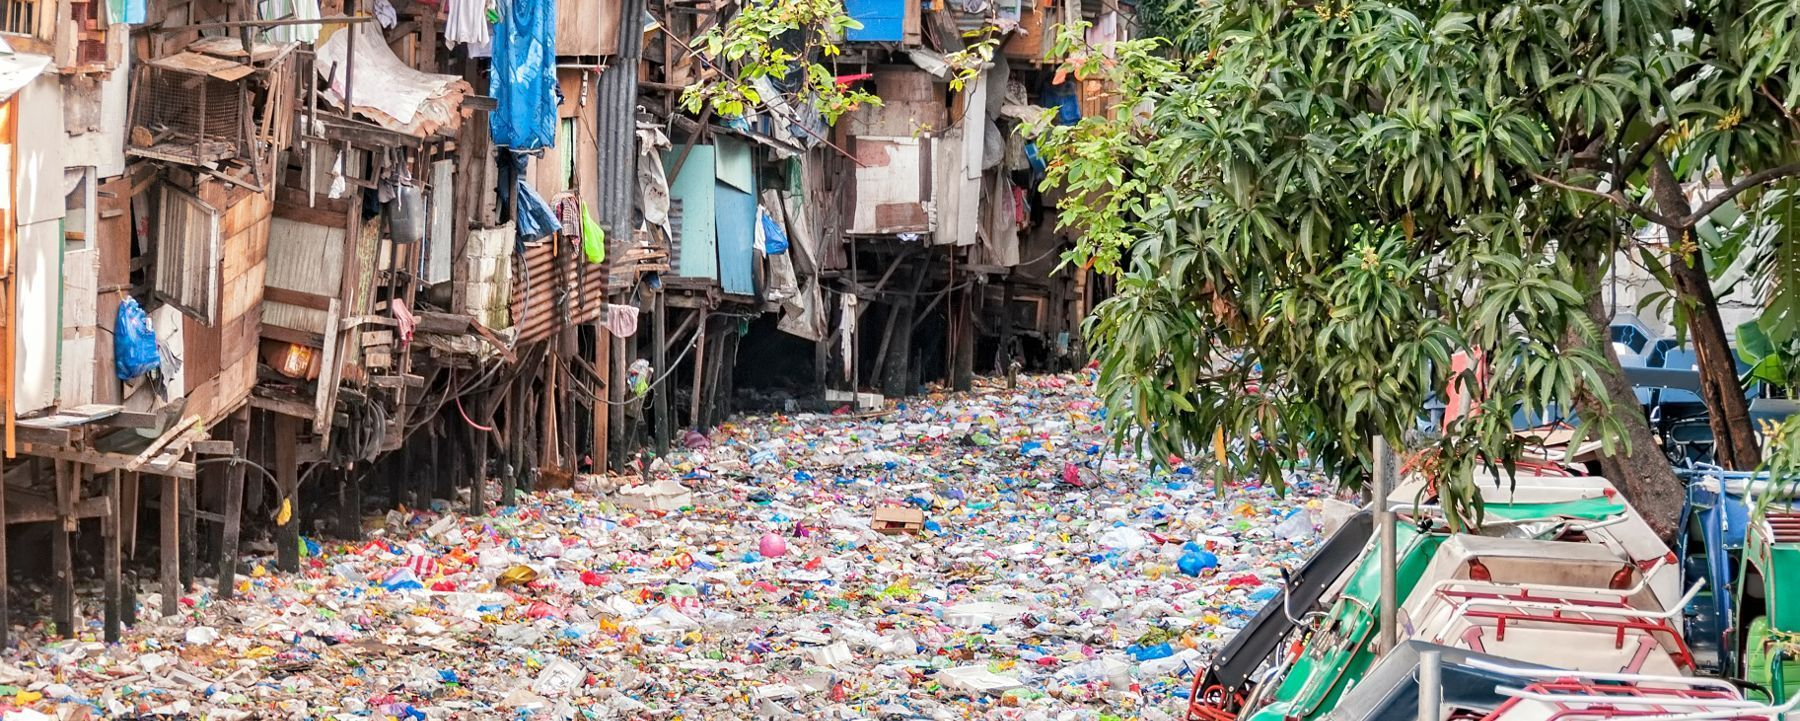 Plastics Emit Greenhouse Gases as They Degrade